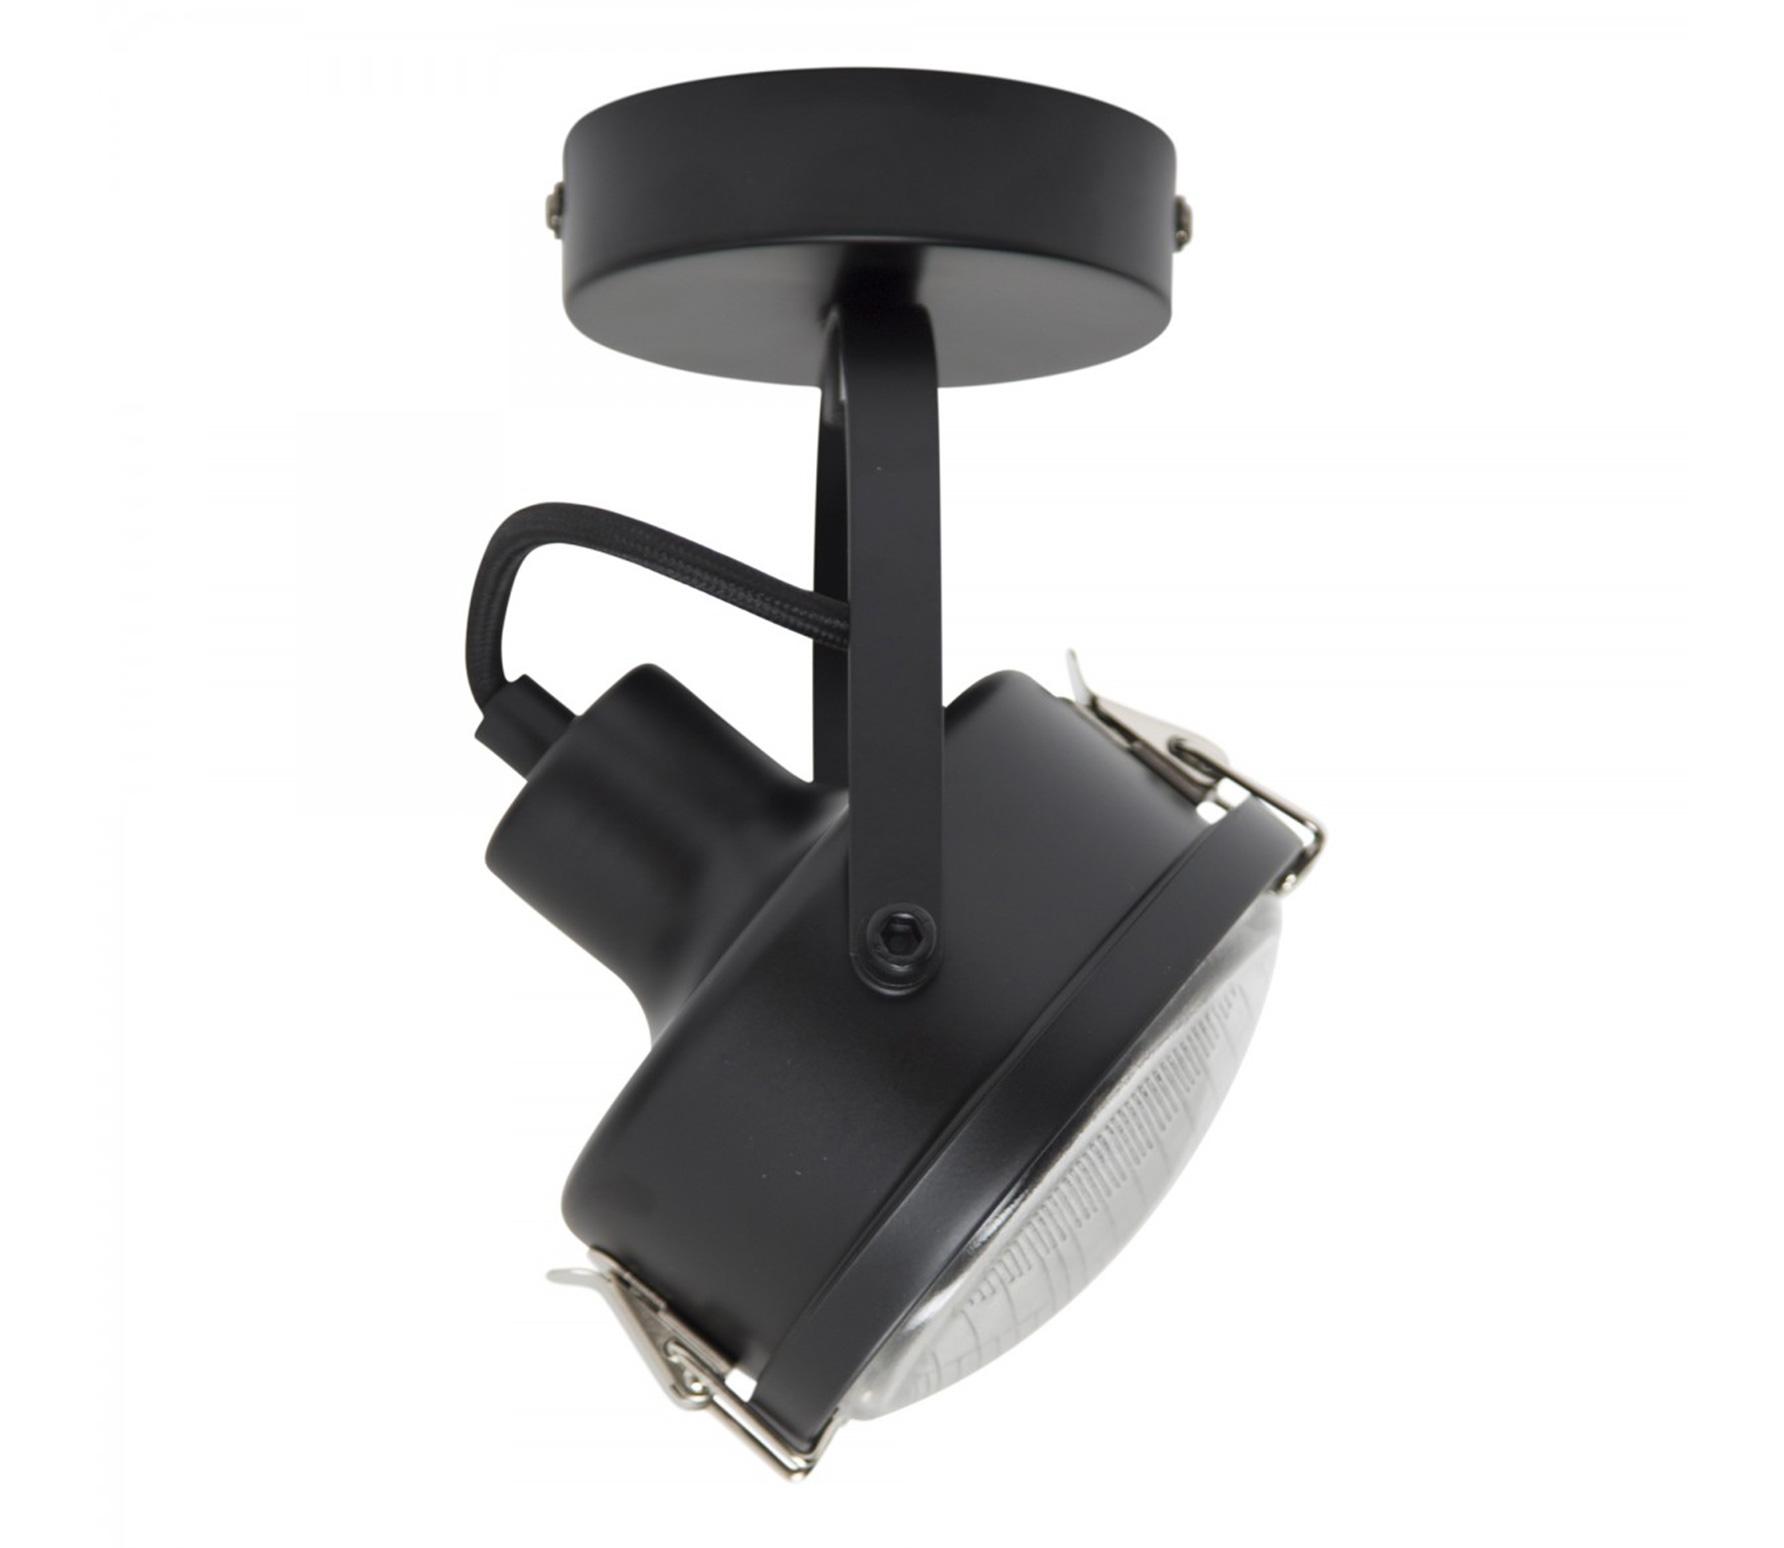 Satellite 1 plafondlamp wandlamp metaal zwart